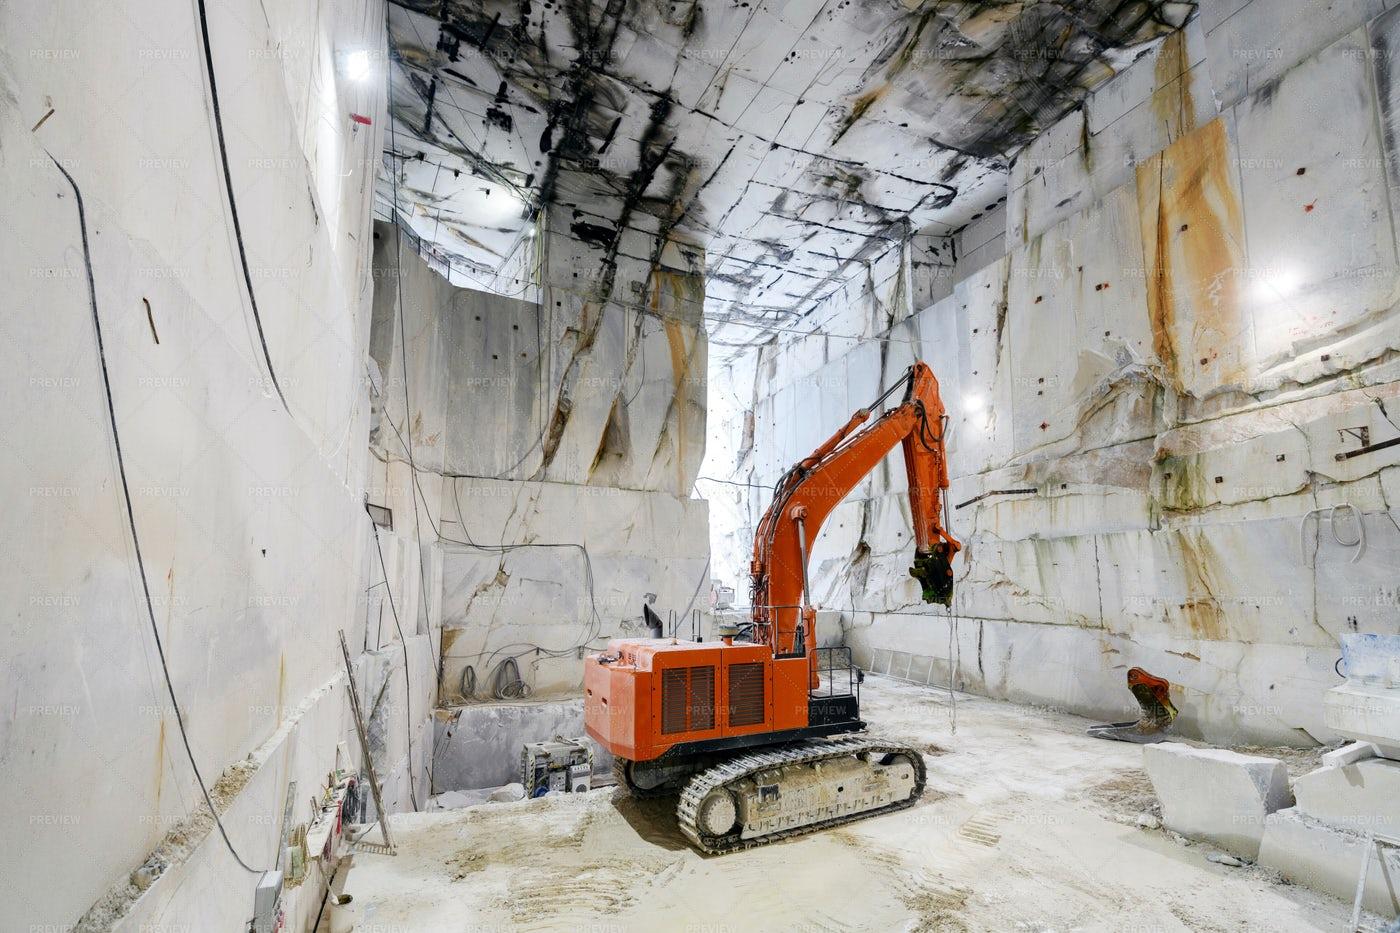 Excavator Inside Marble Quarry: Stock Photos